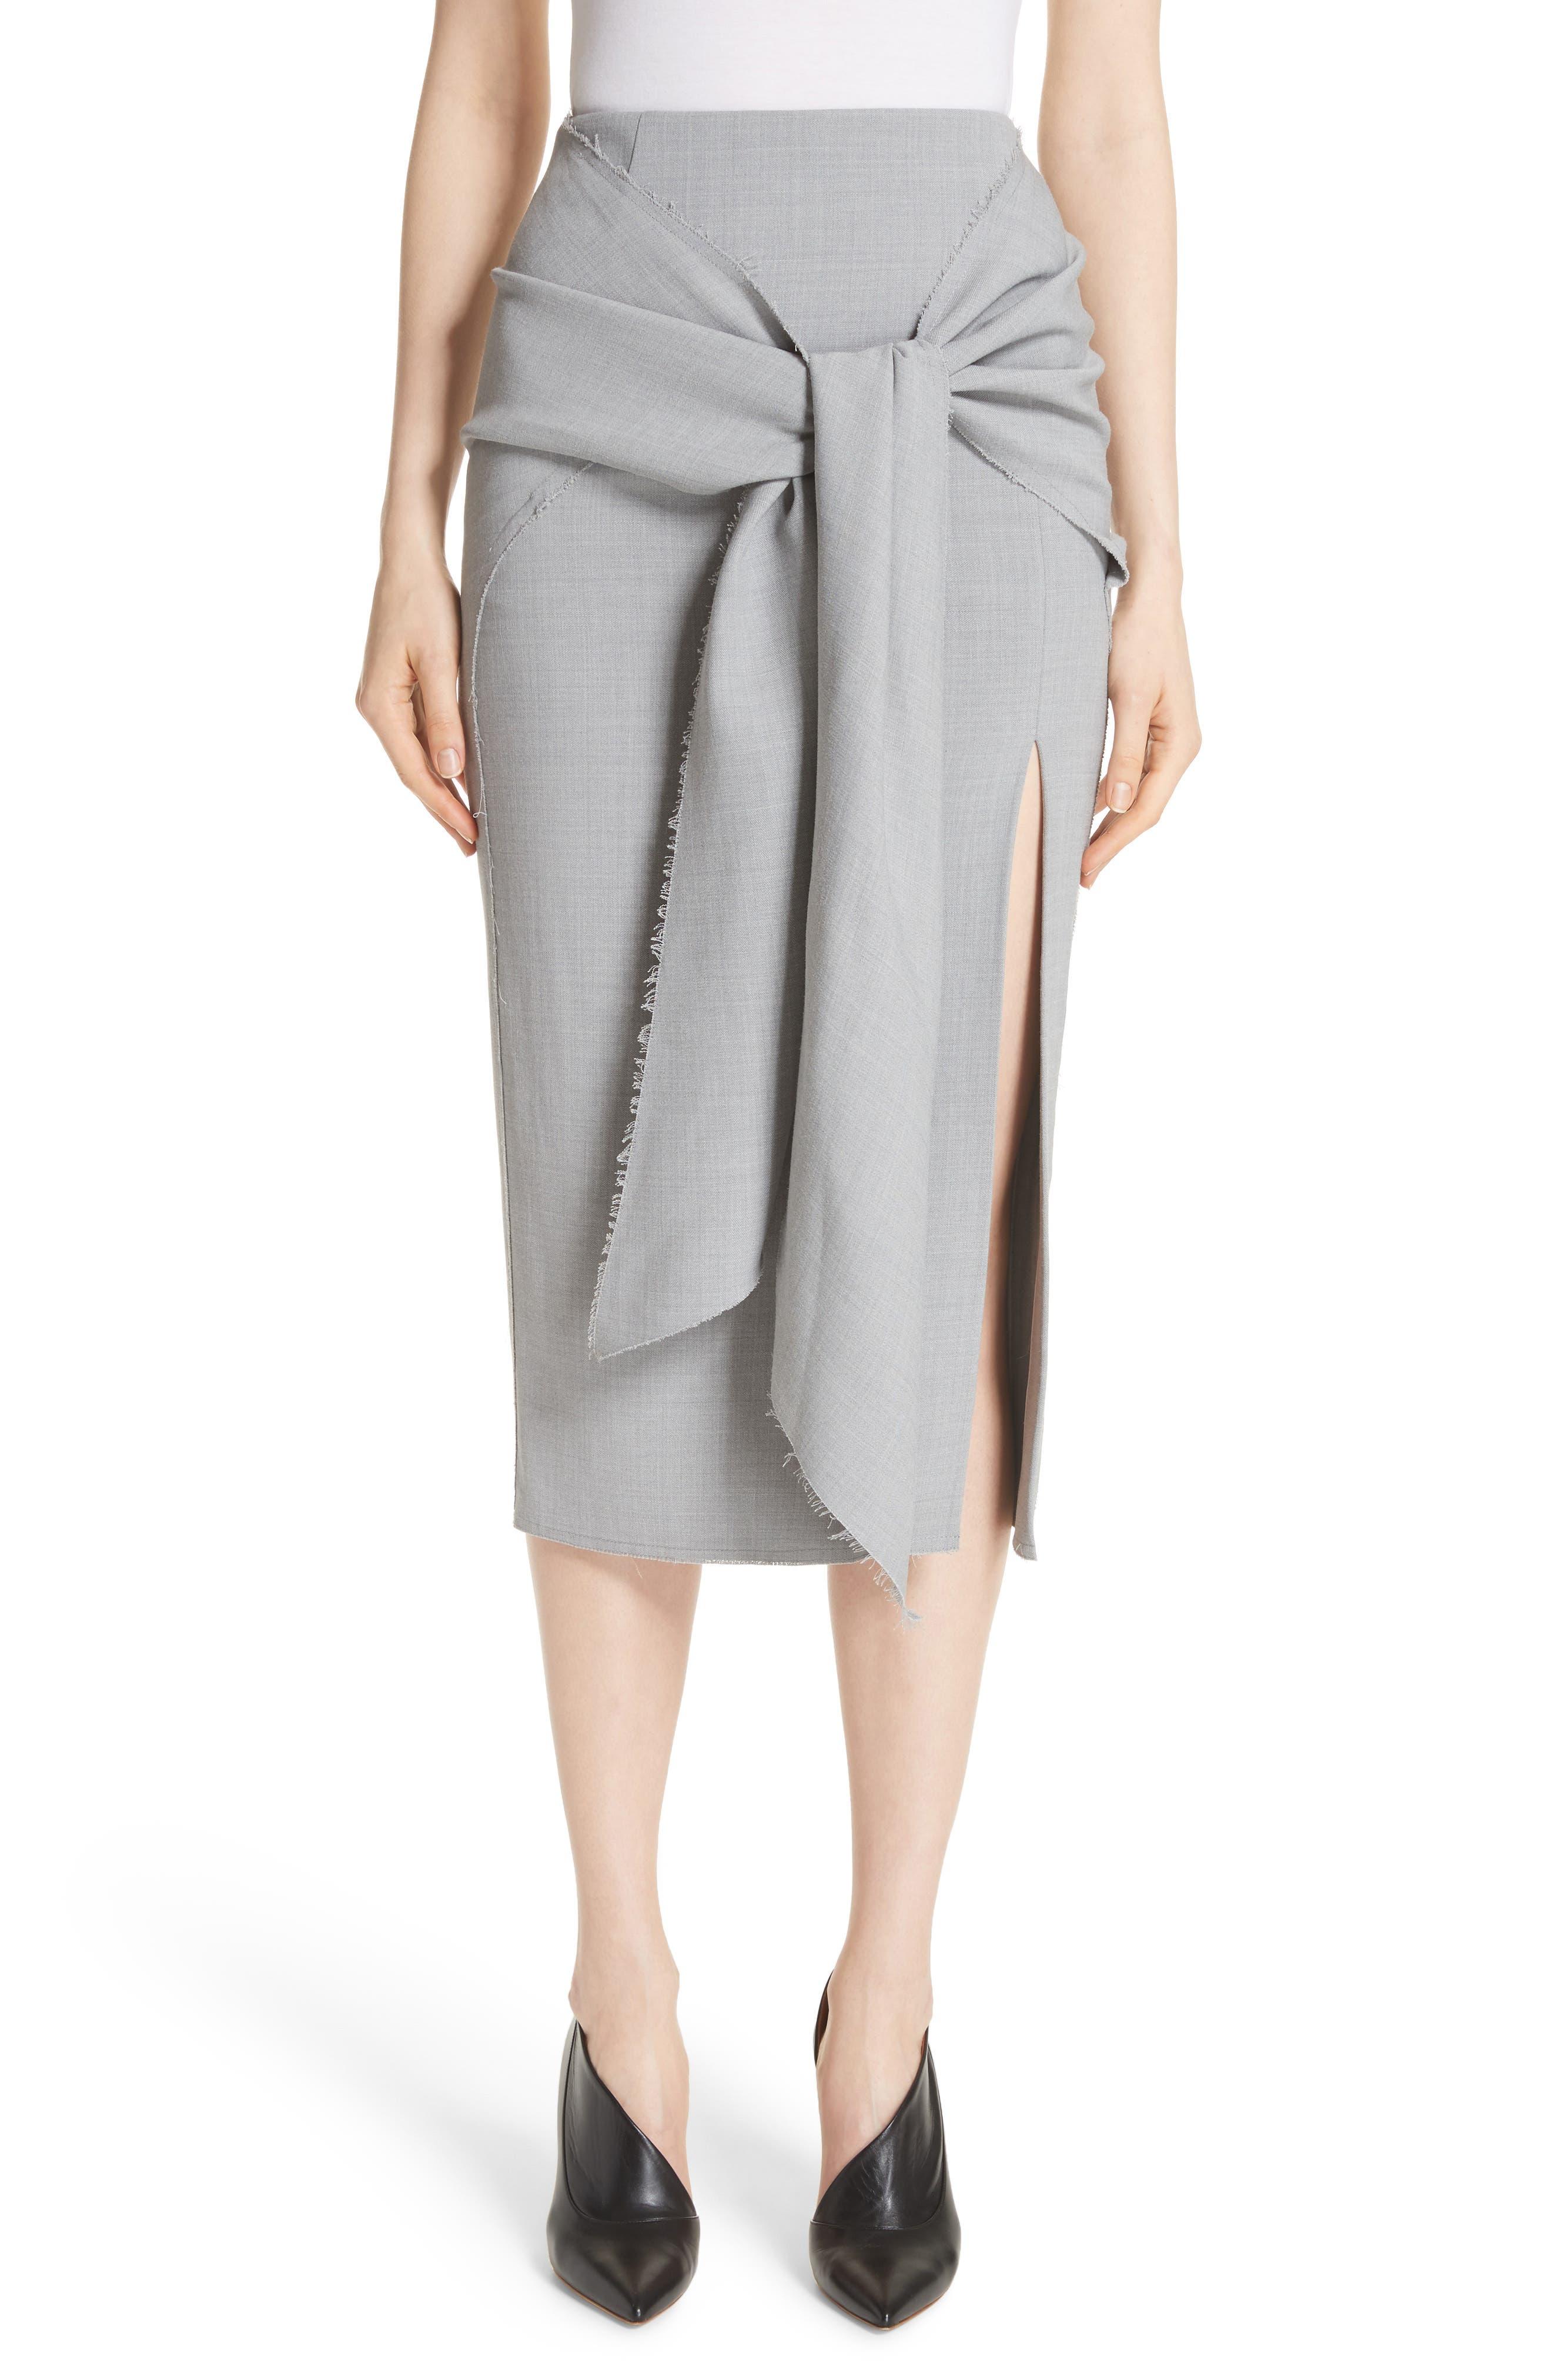 Raw Hem Tie Front Skirt,                             Main thumbnail 1, color,                             Light Grey Melange